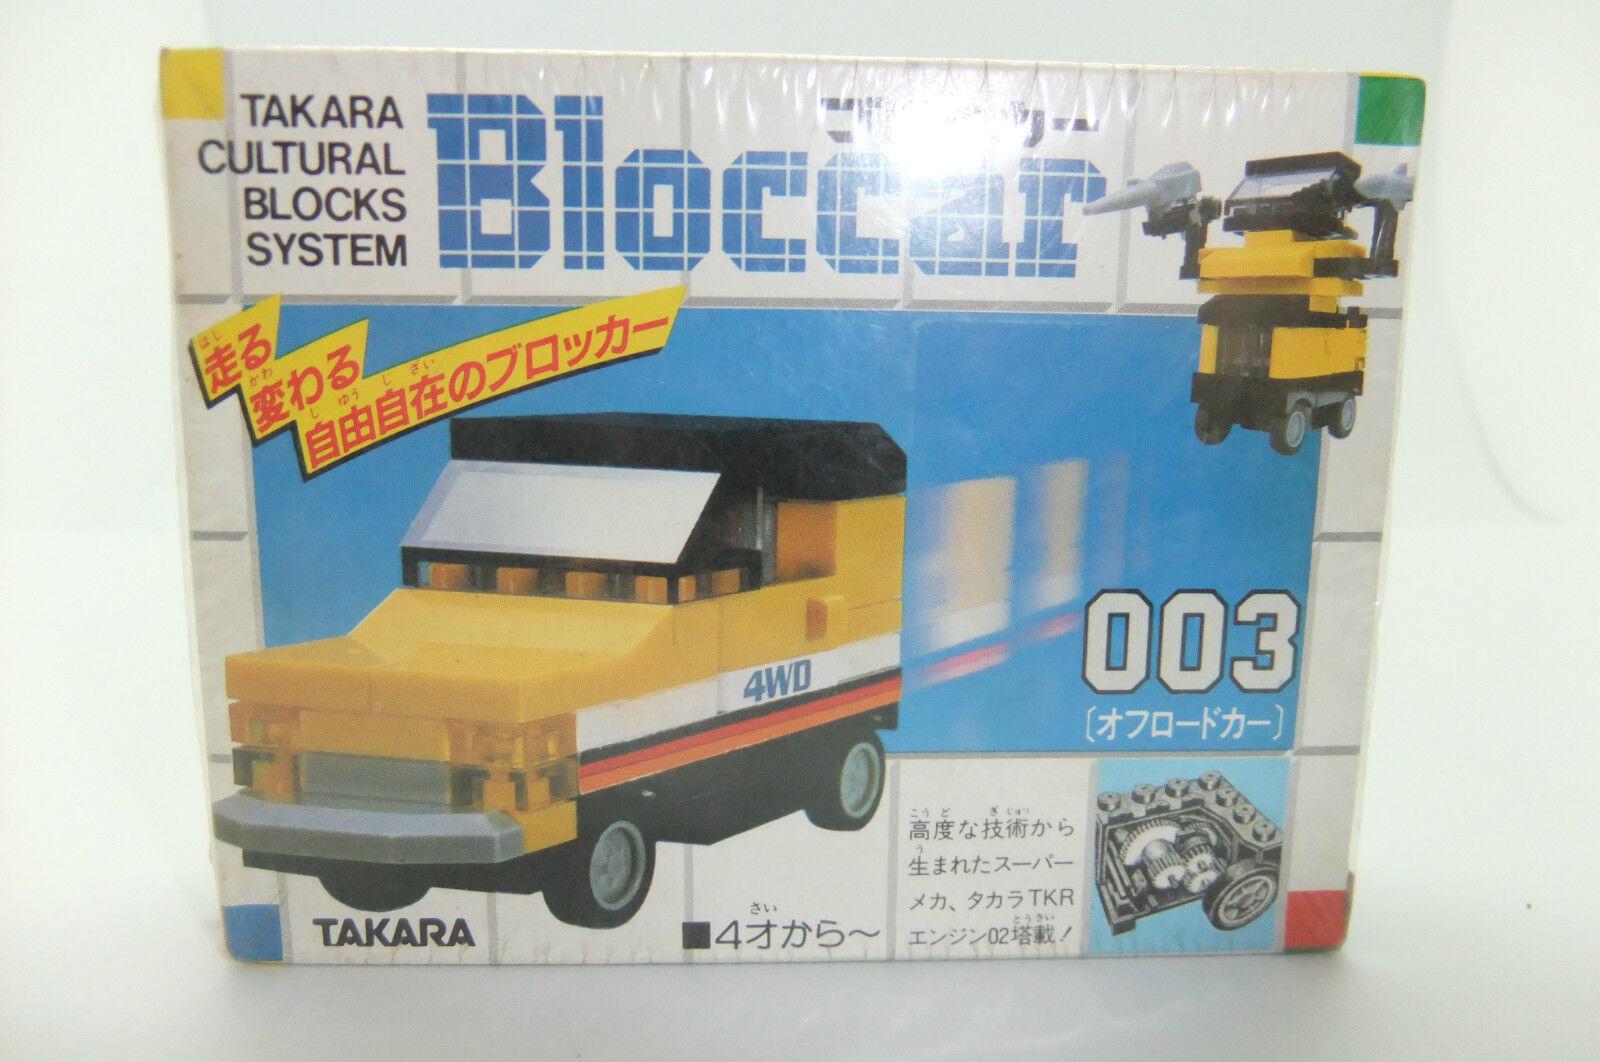 1980 Transformers Takara Bloccar 003 Misb Vintage